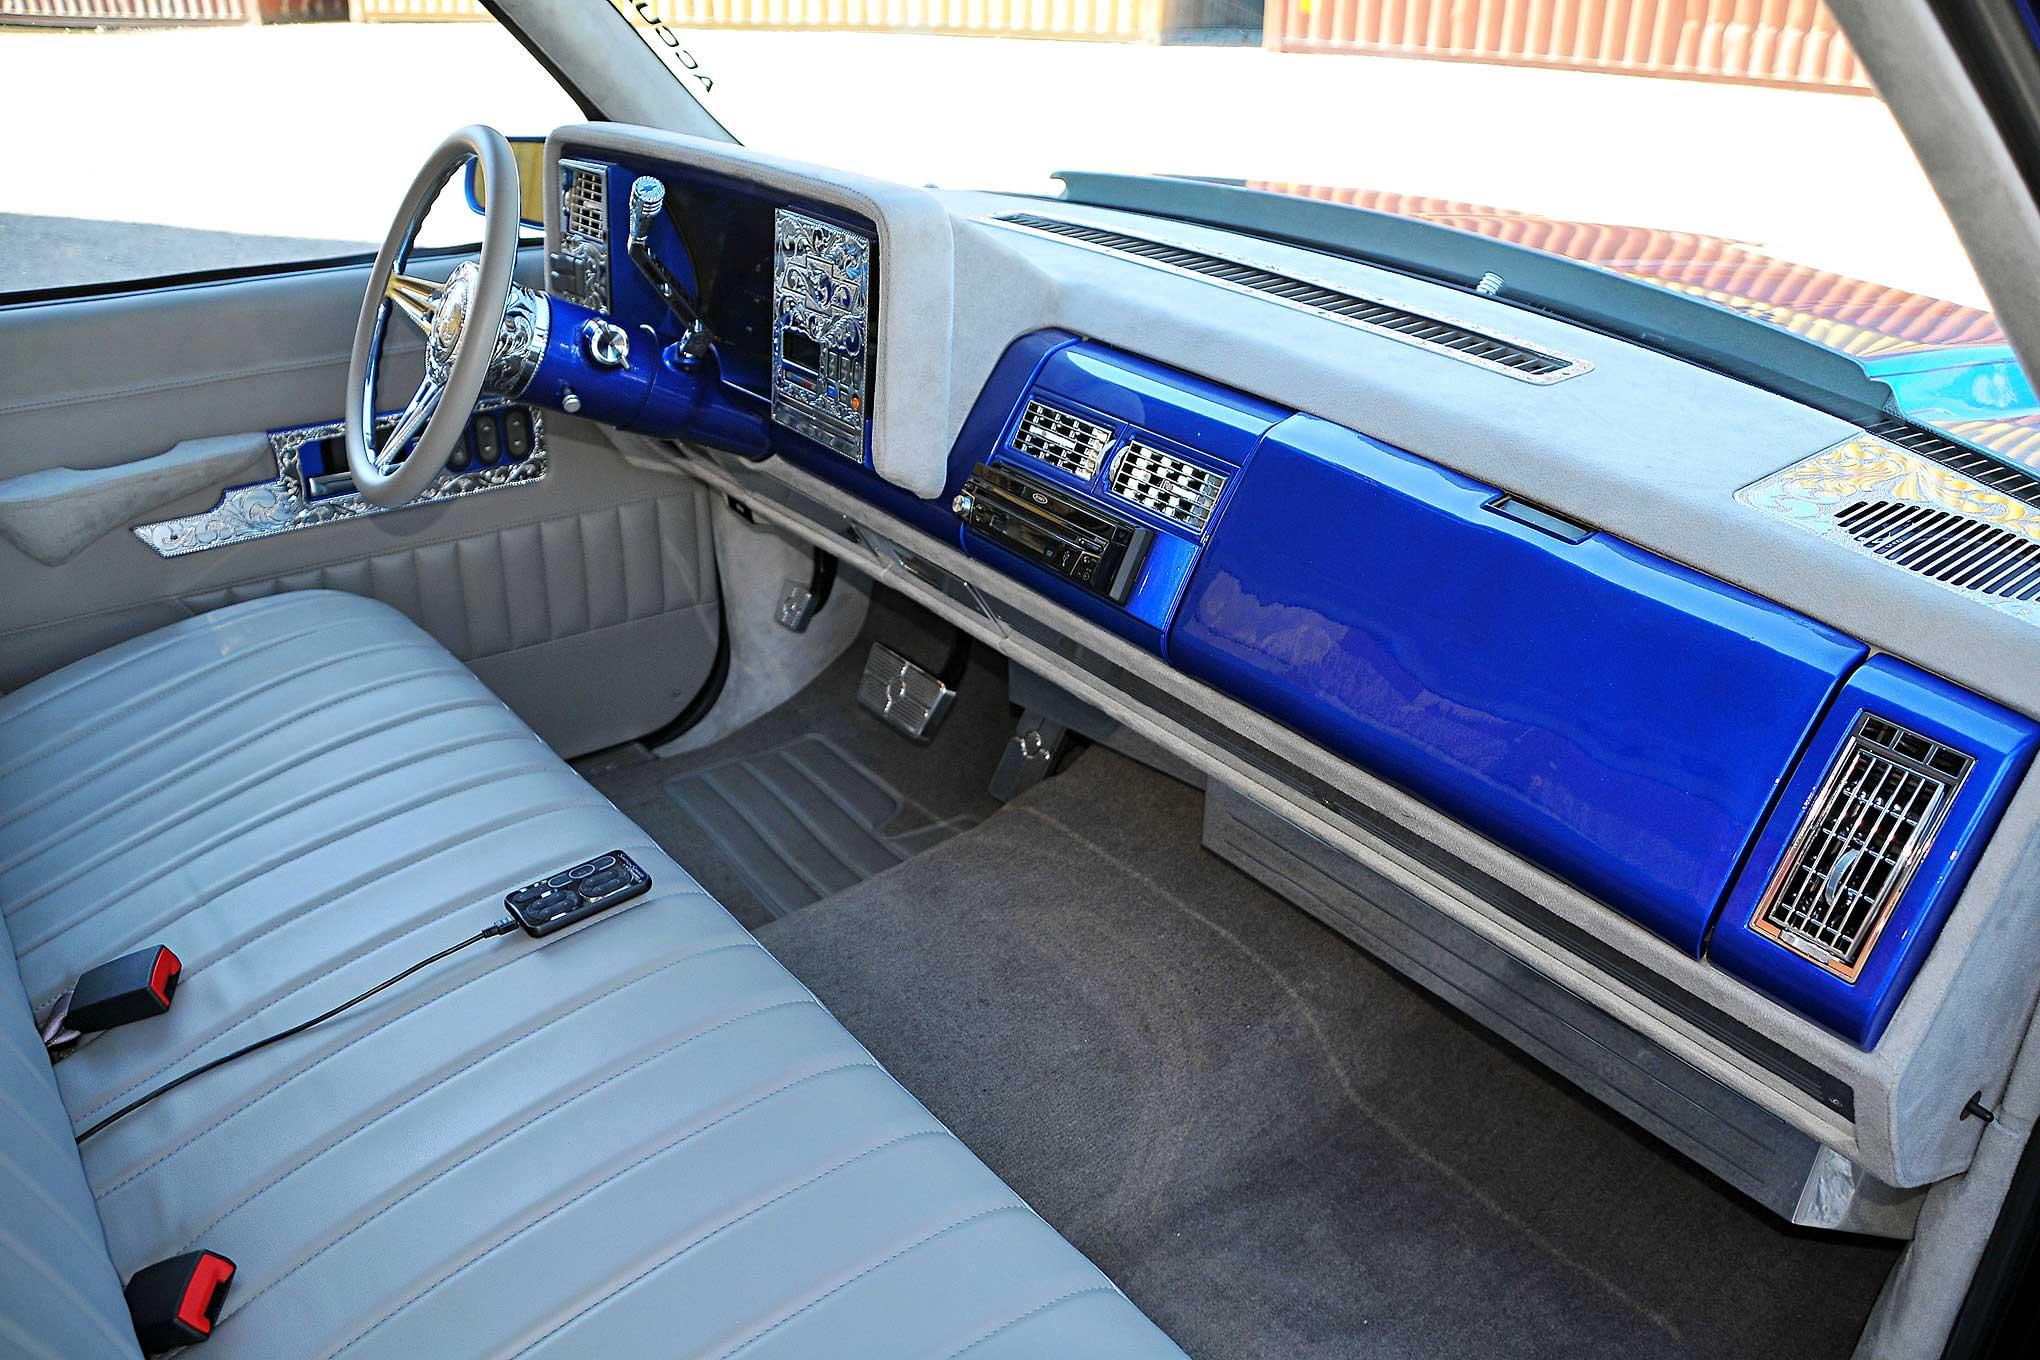 1992 Chevrolet 1500 - Truckin' & Tuckin'